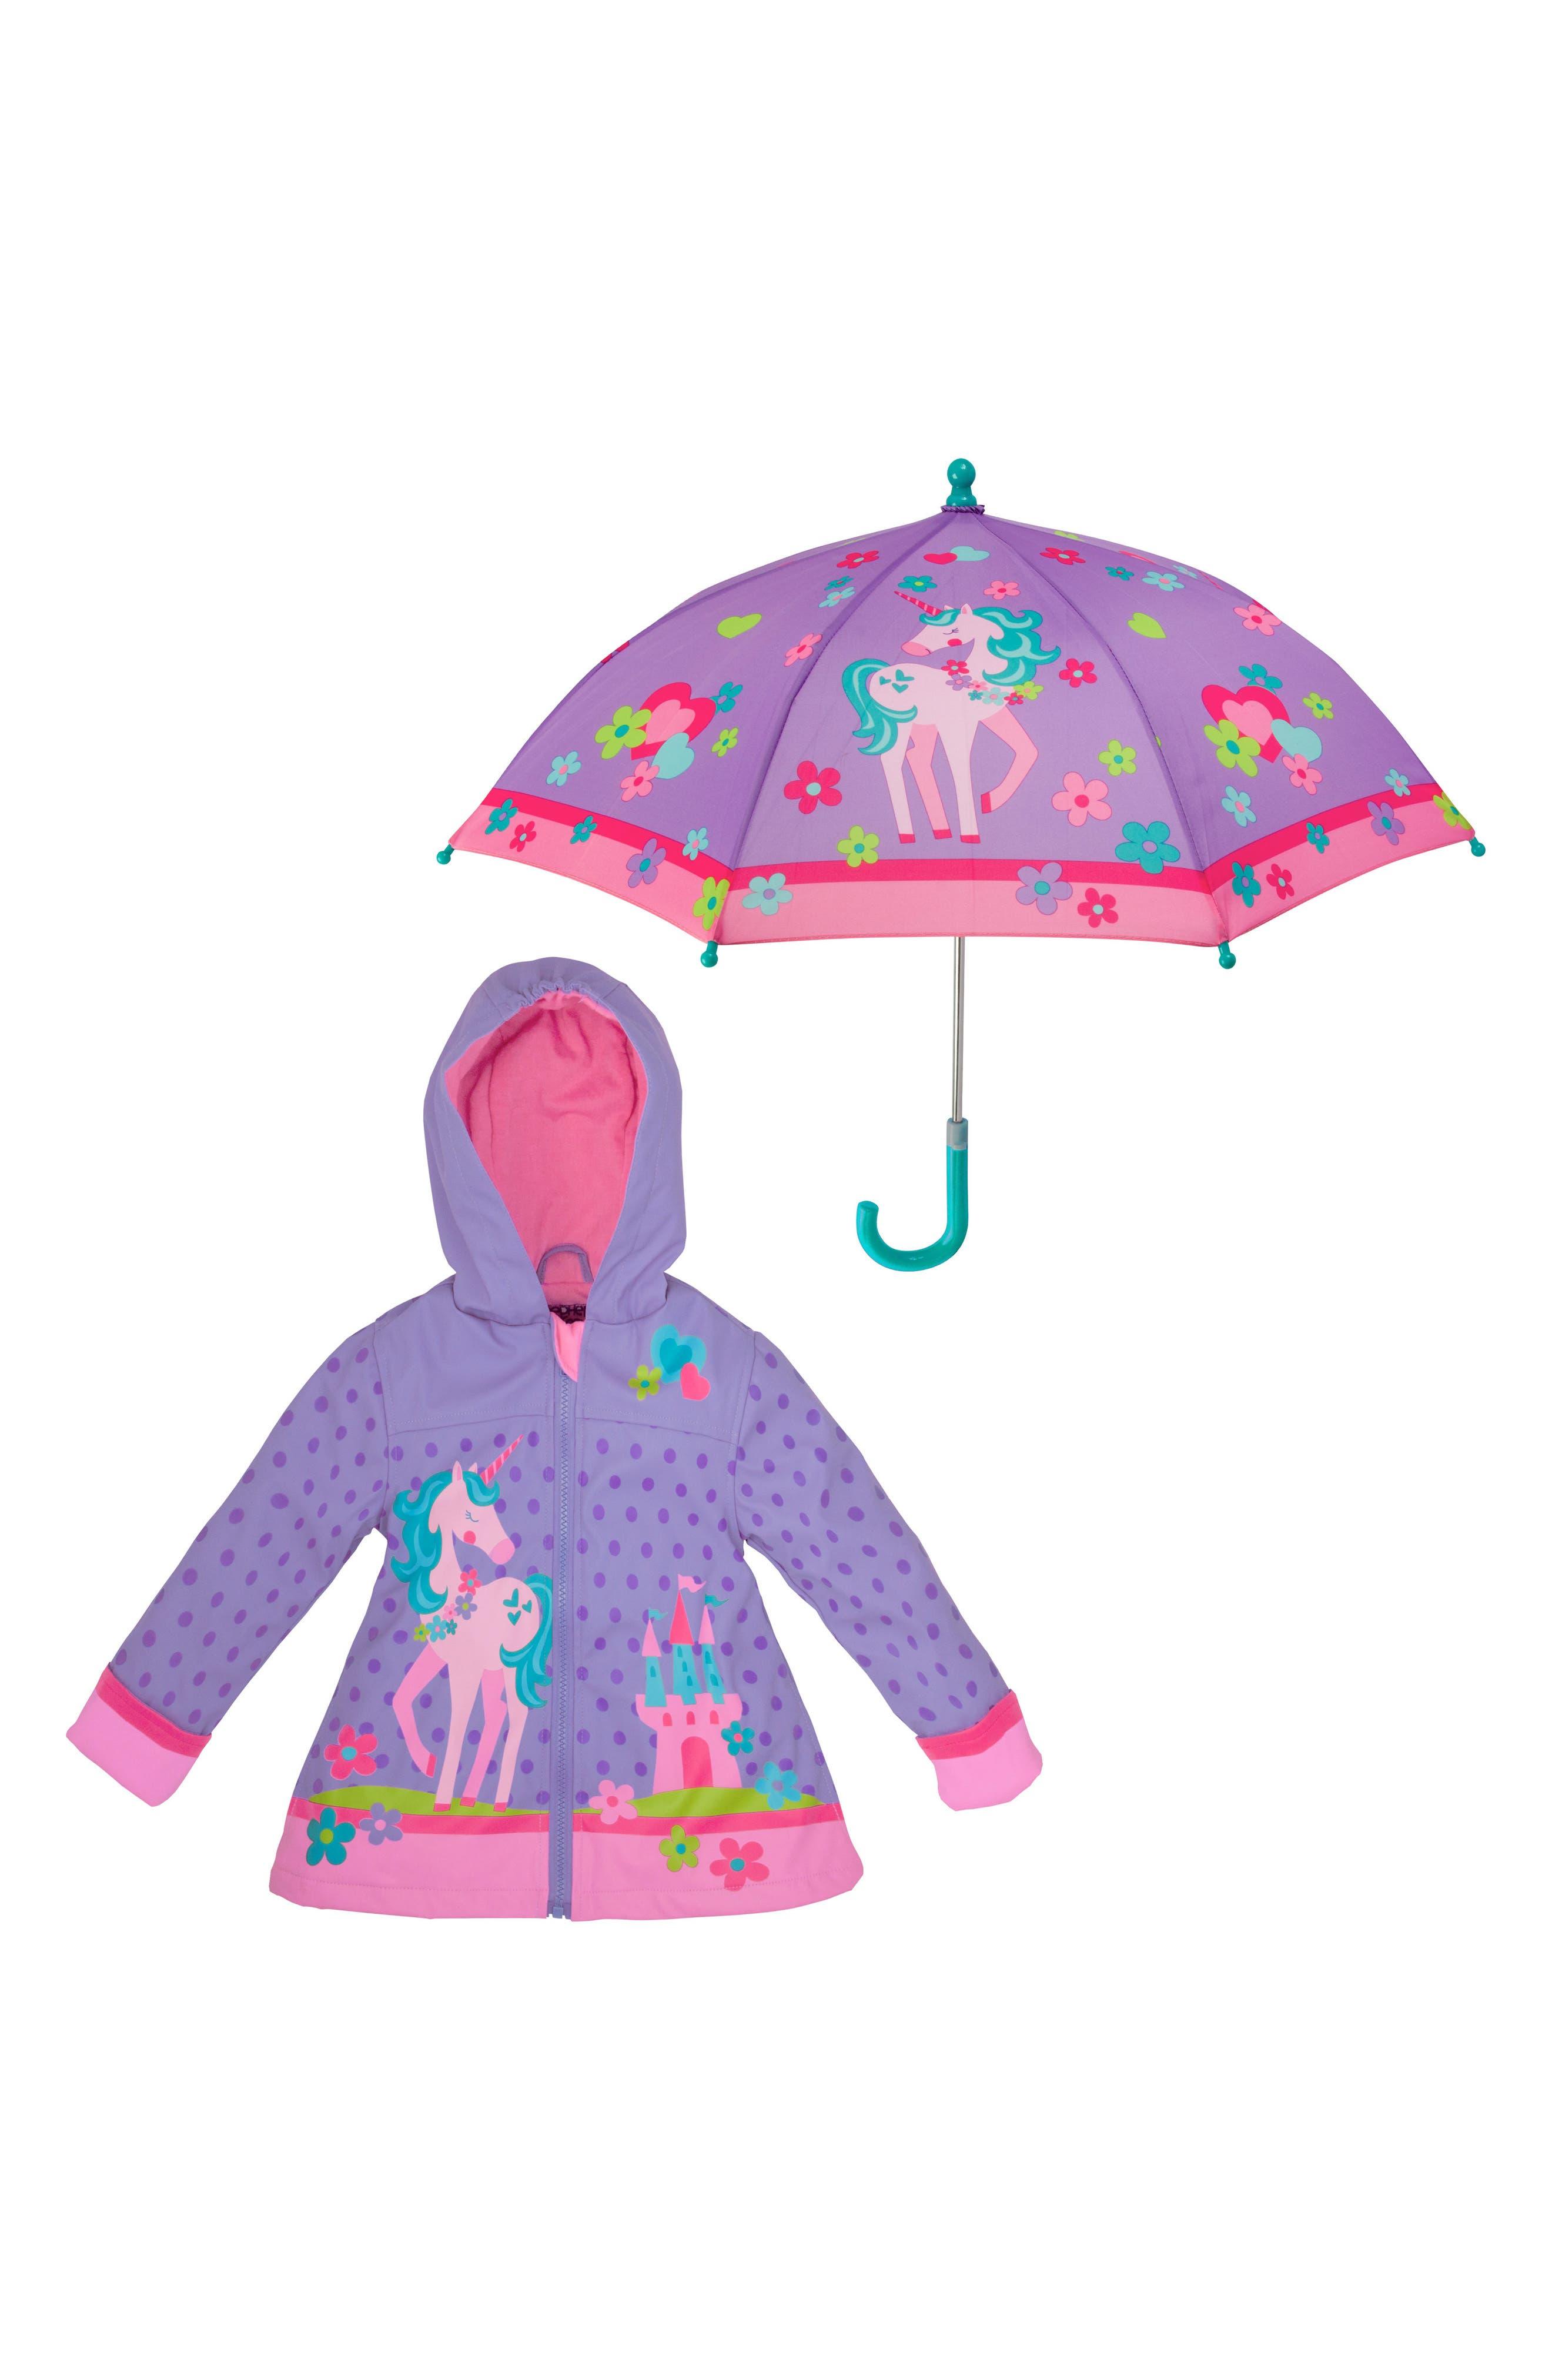 Main Image - Stephen Joseph Unicorn Raincoat & Umbrella Set (Toddler Girls, Little Girls)